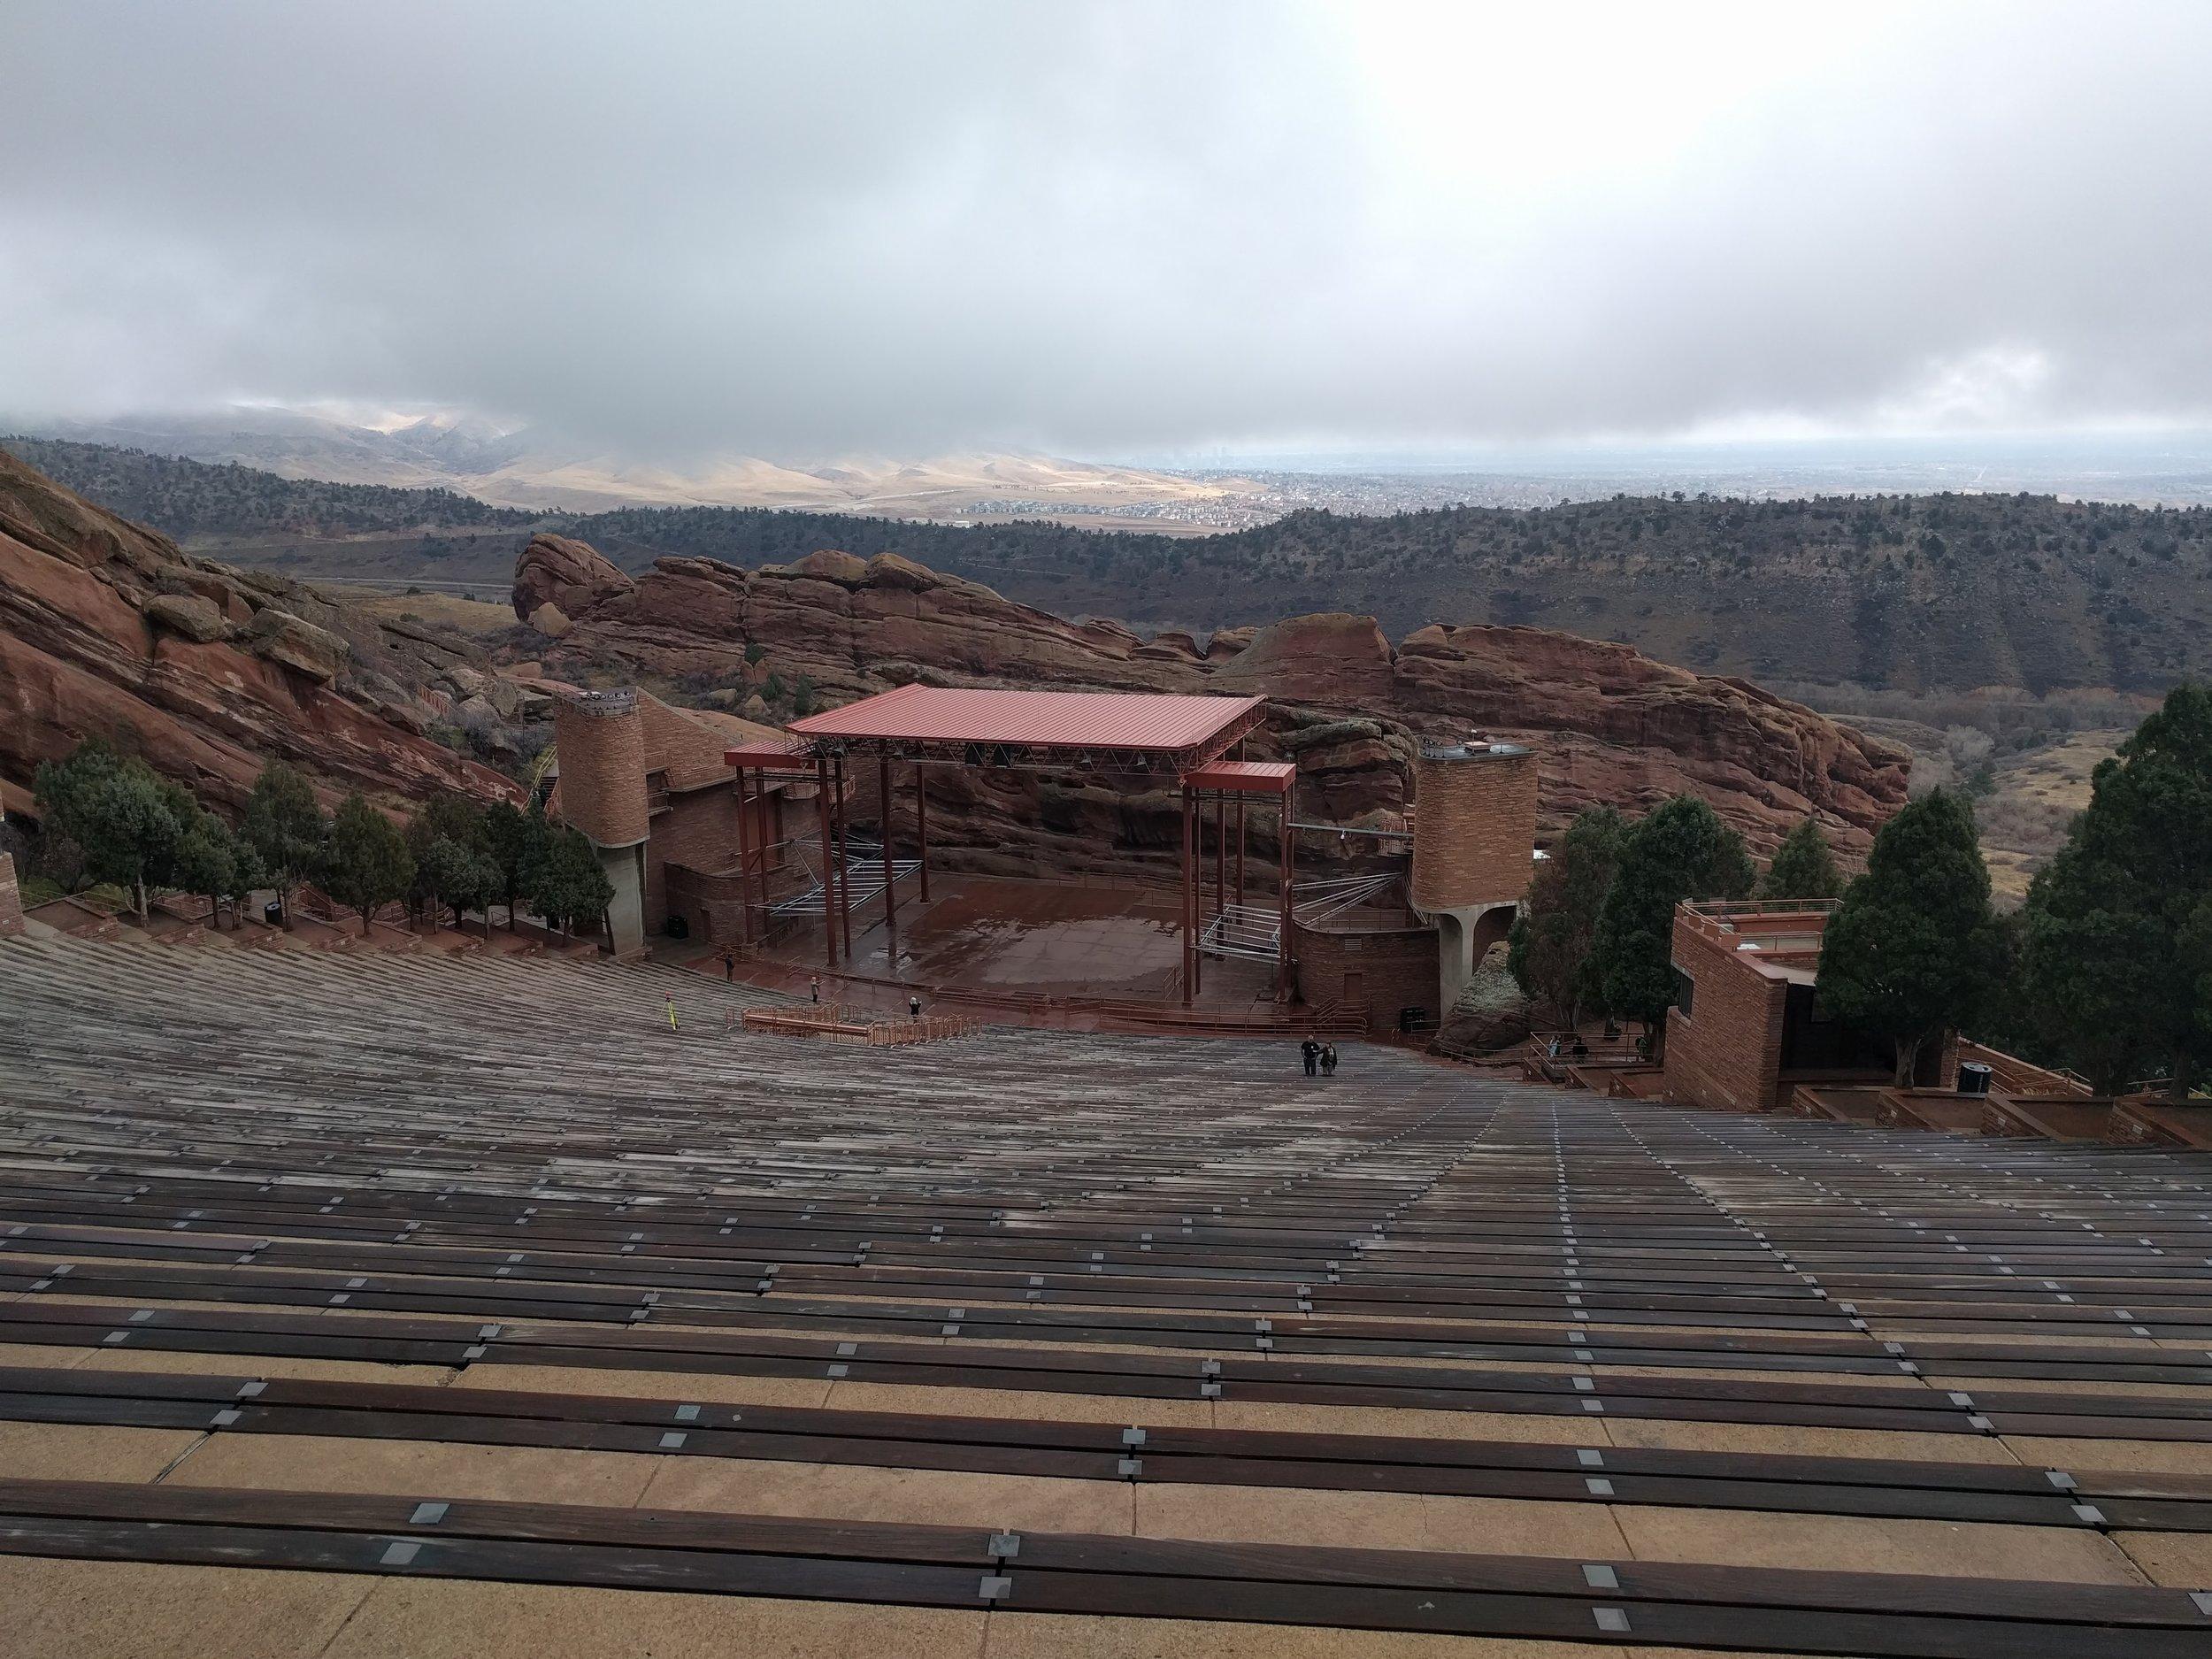 Red Rocks Amphitheater in Morrison, CO